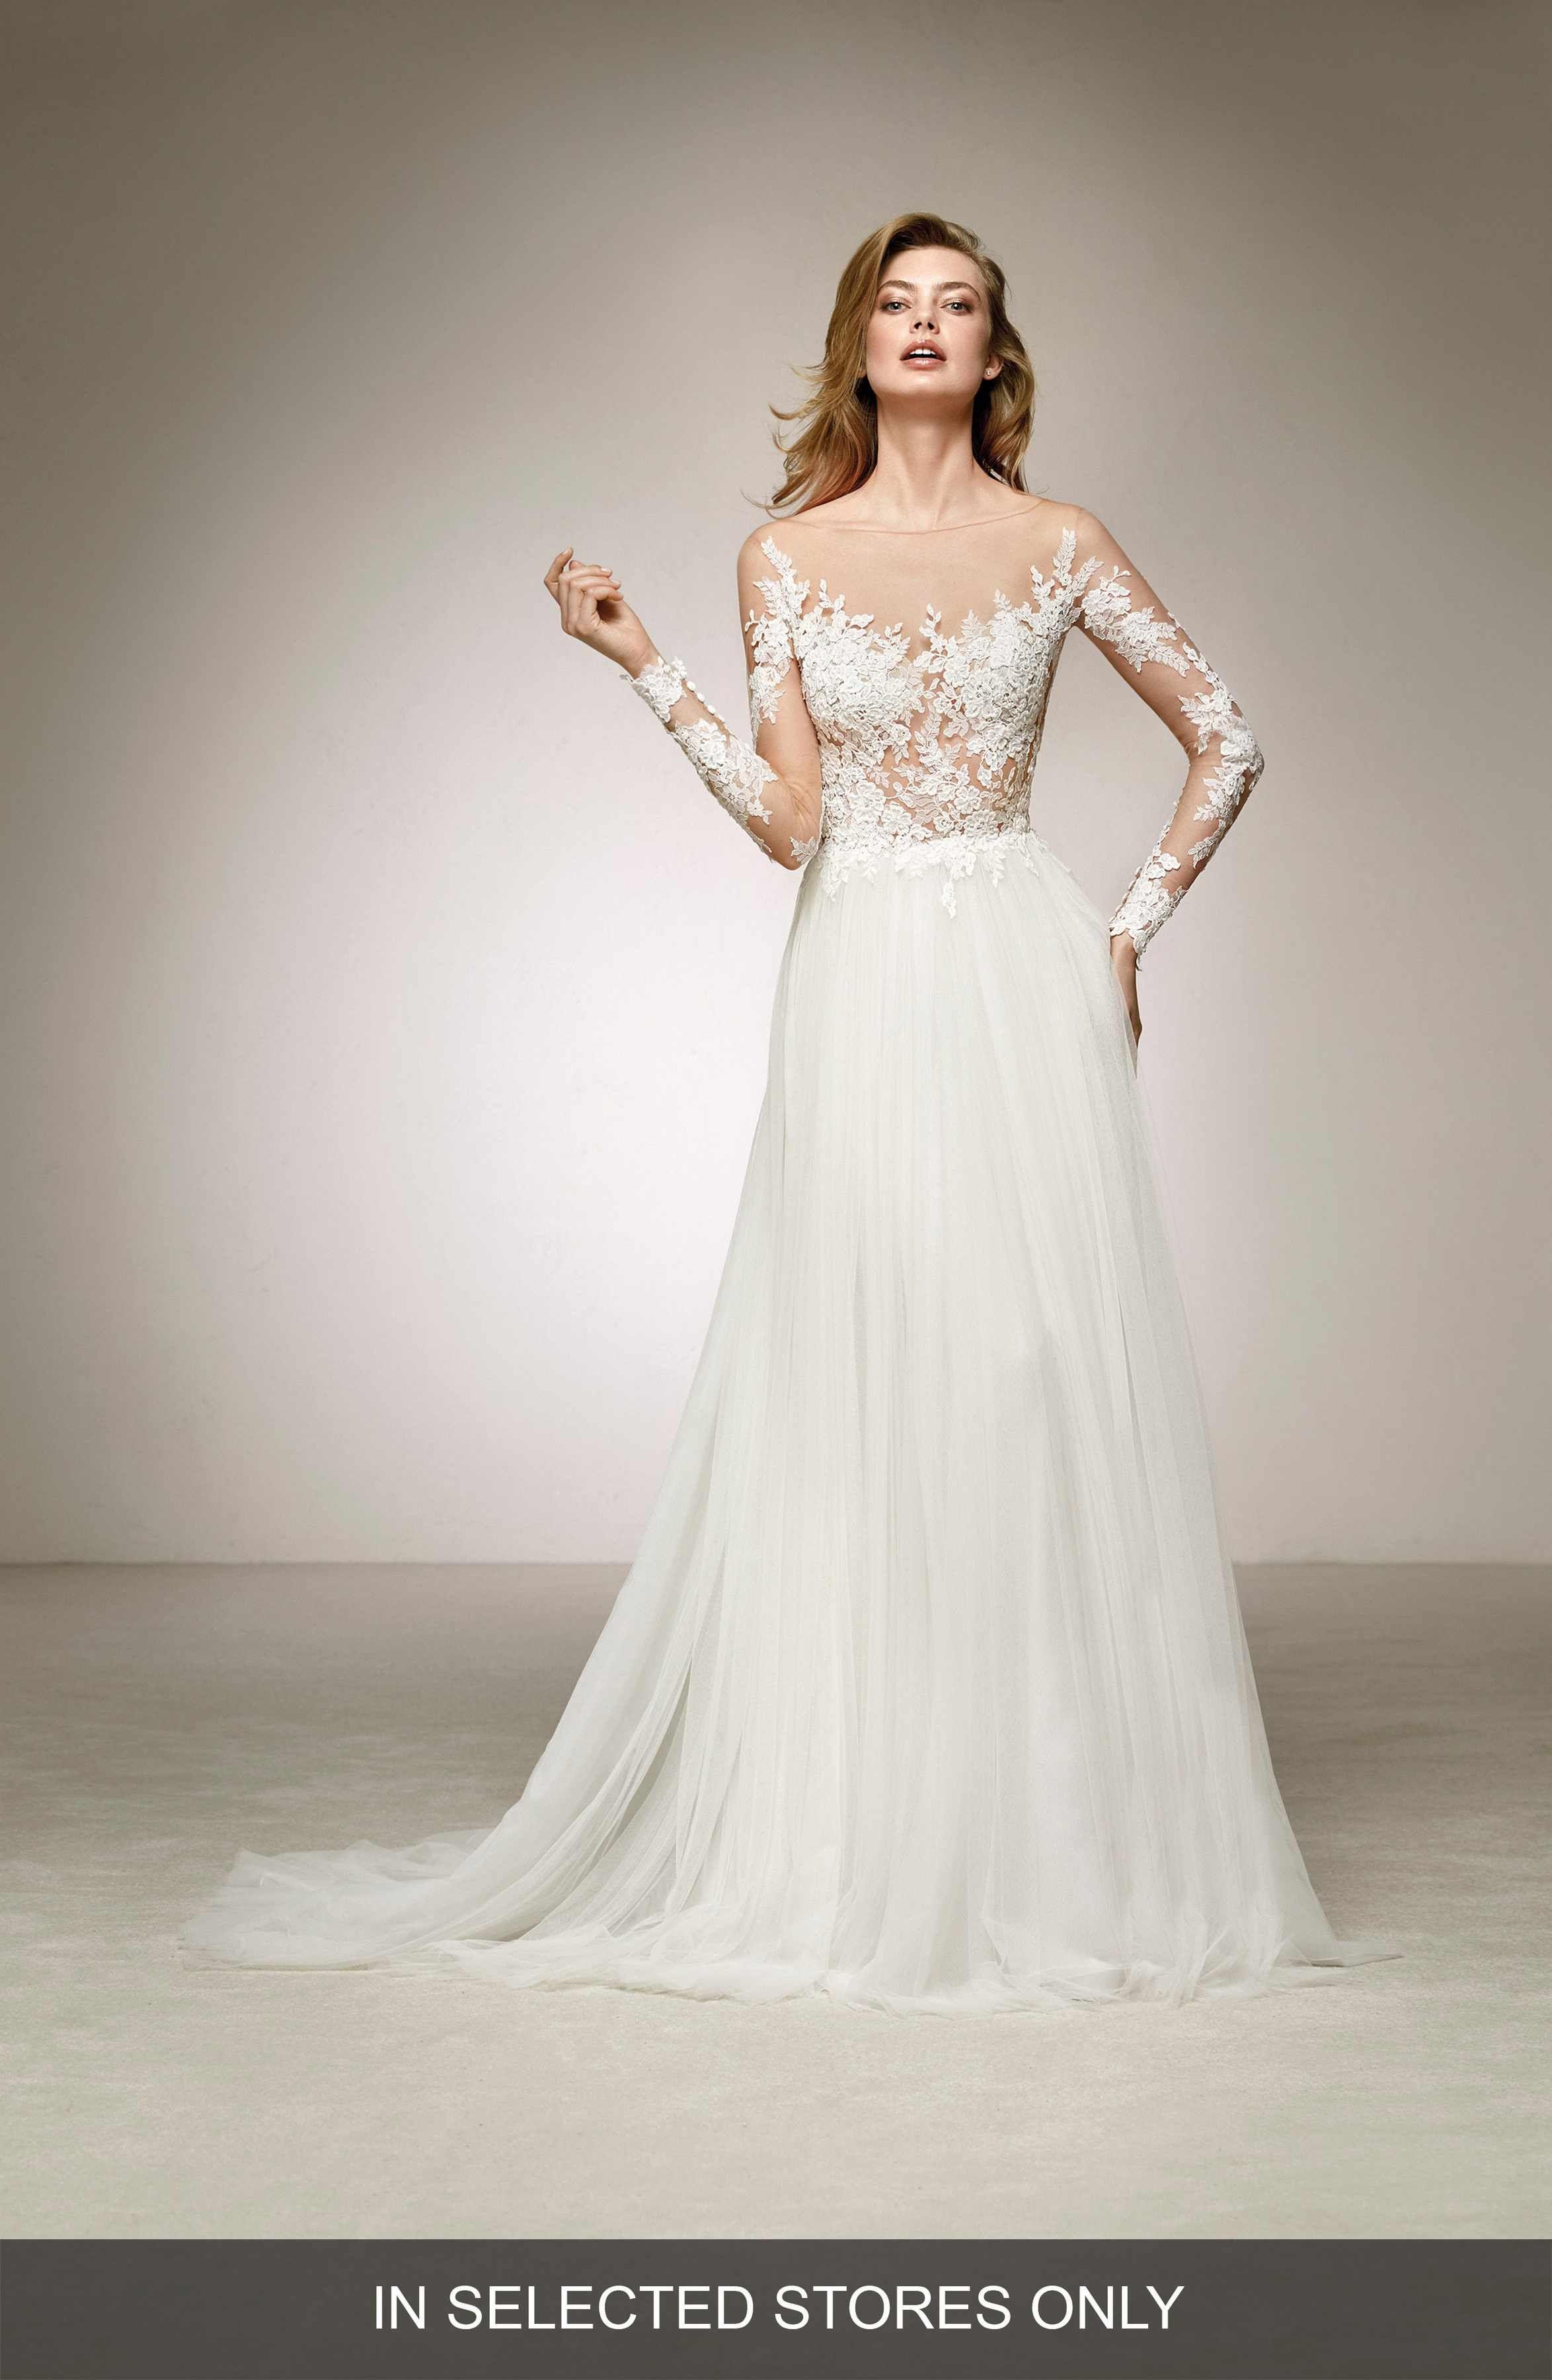 Main Image - Pronovias Datil Illusion Tulle A-Line Gown   wedding ...